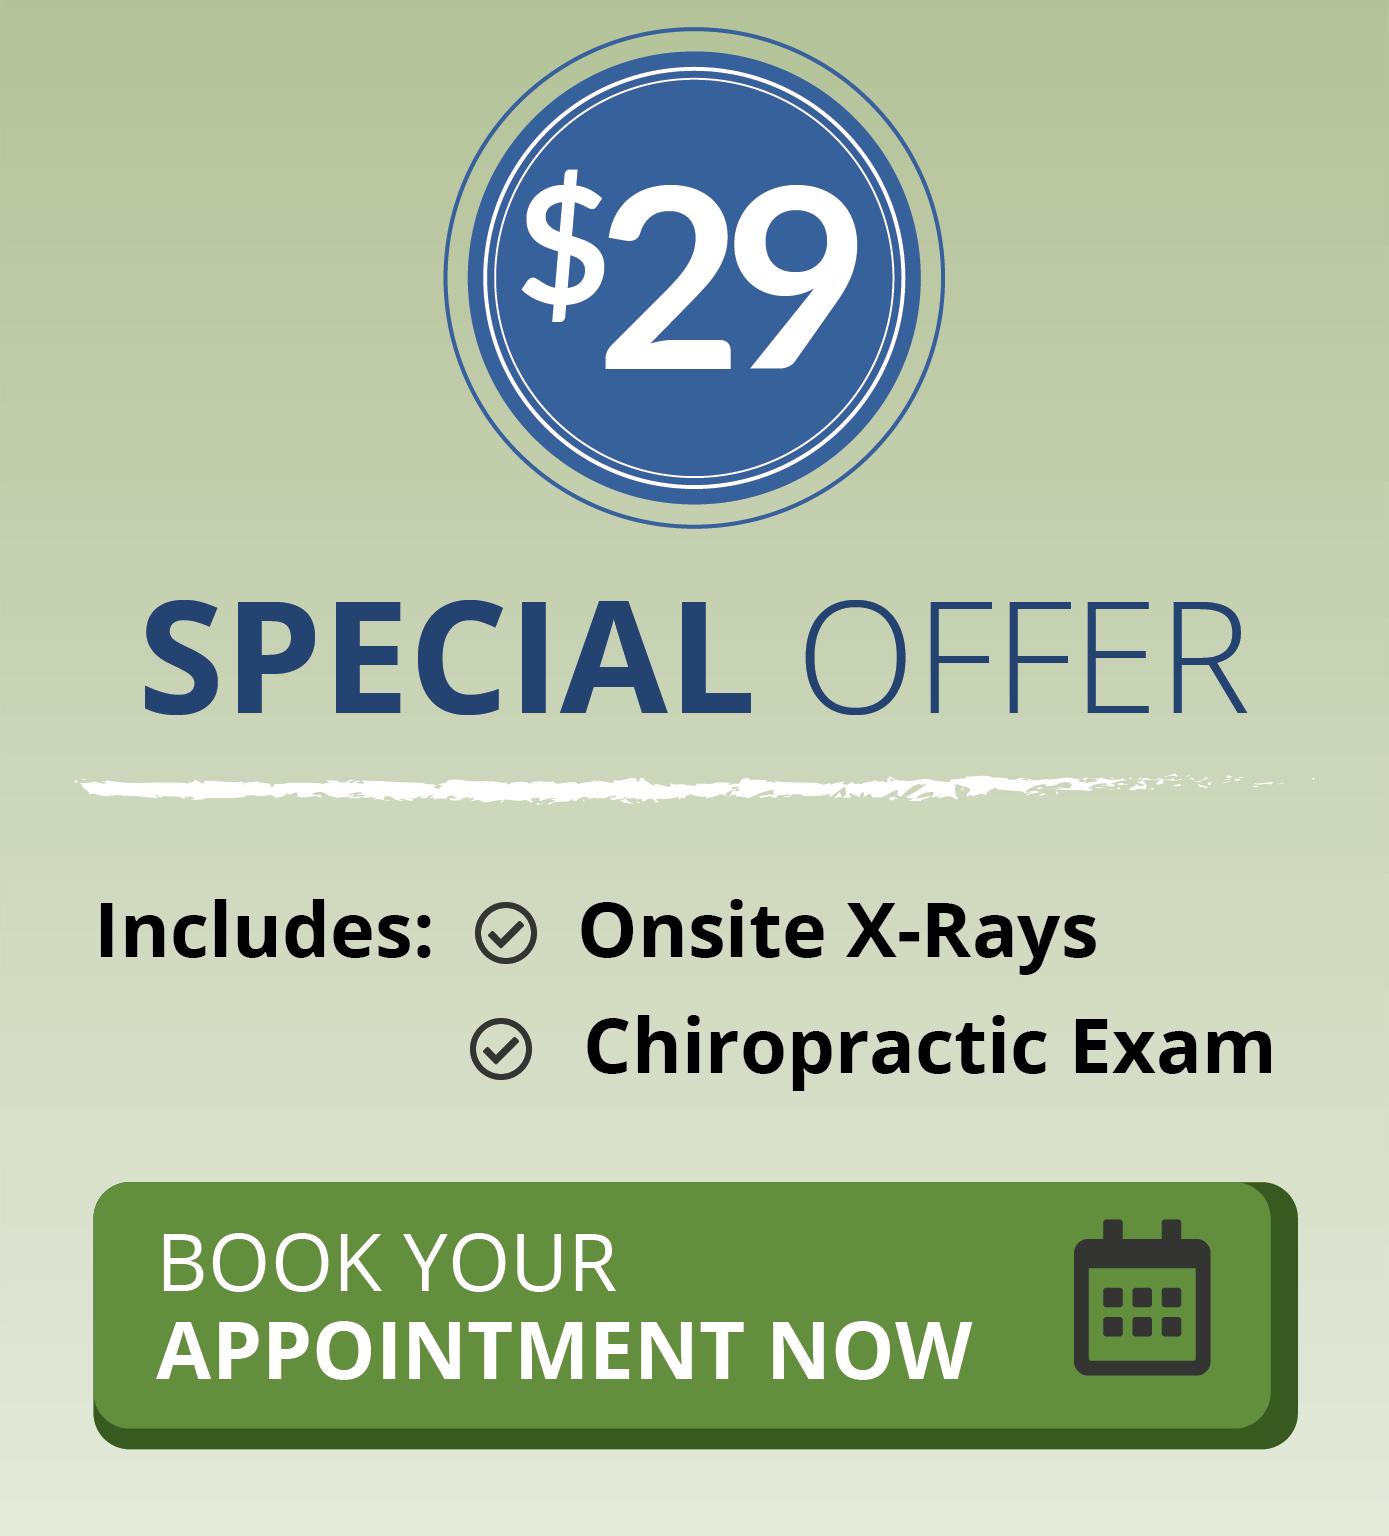 $29 Same-Day Chiropractor